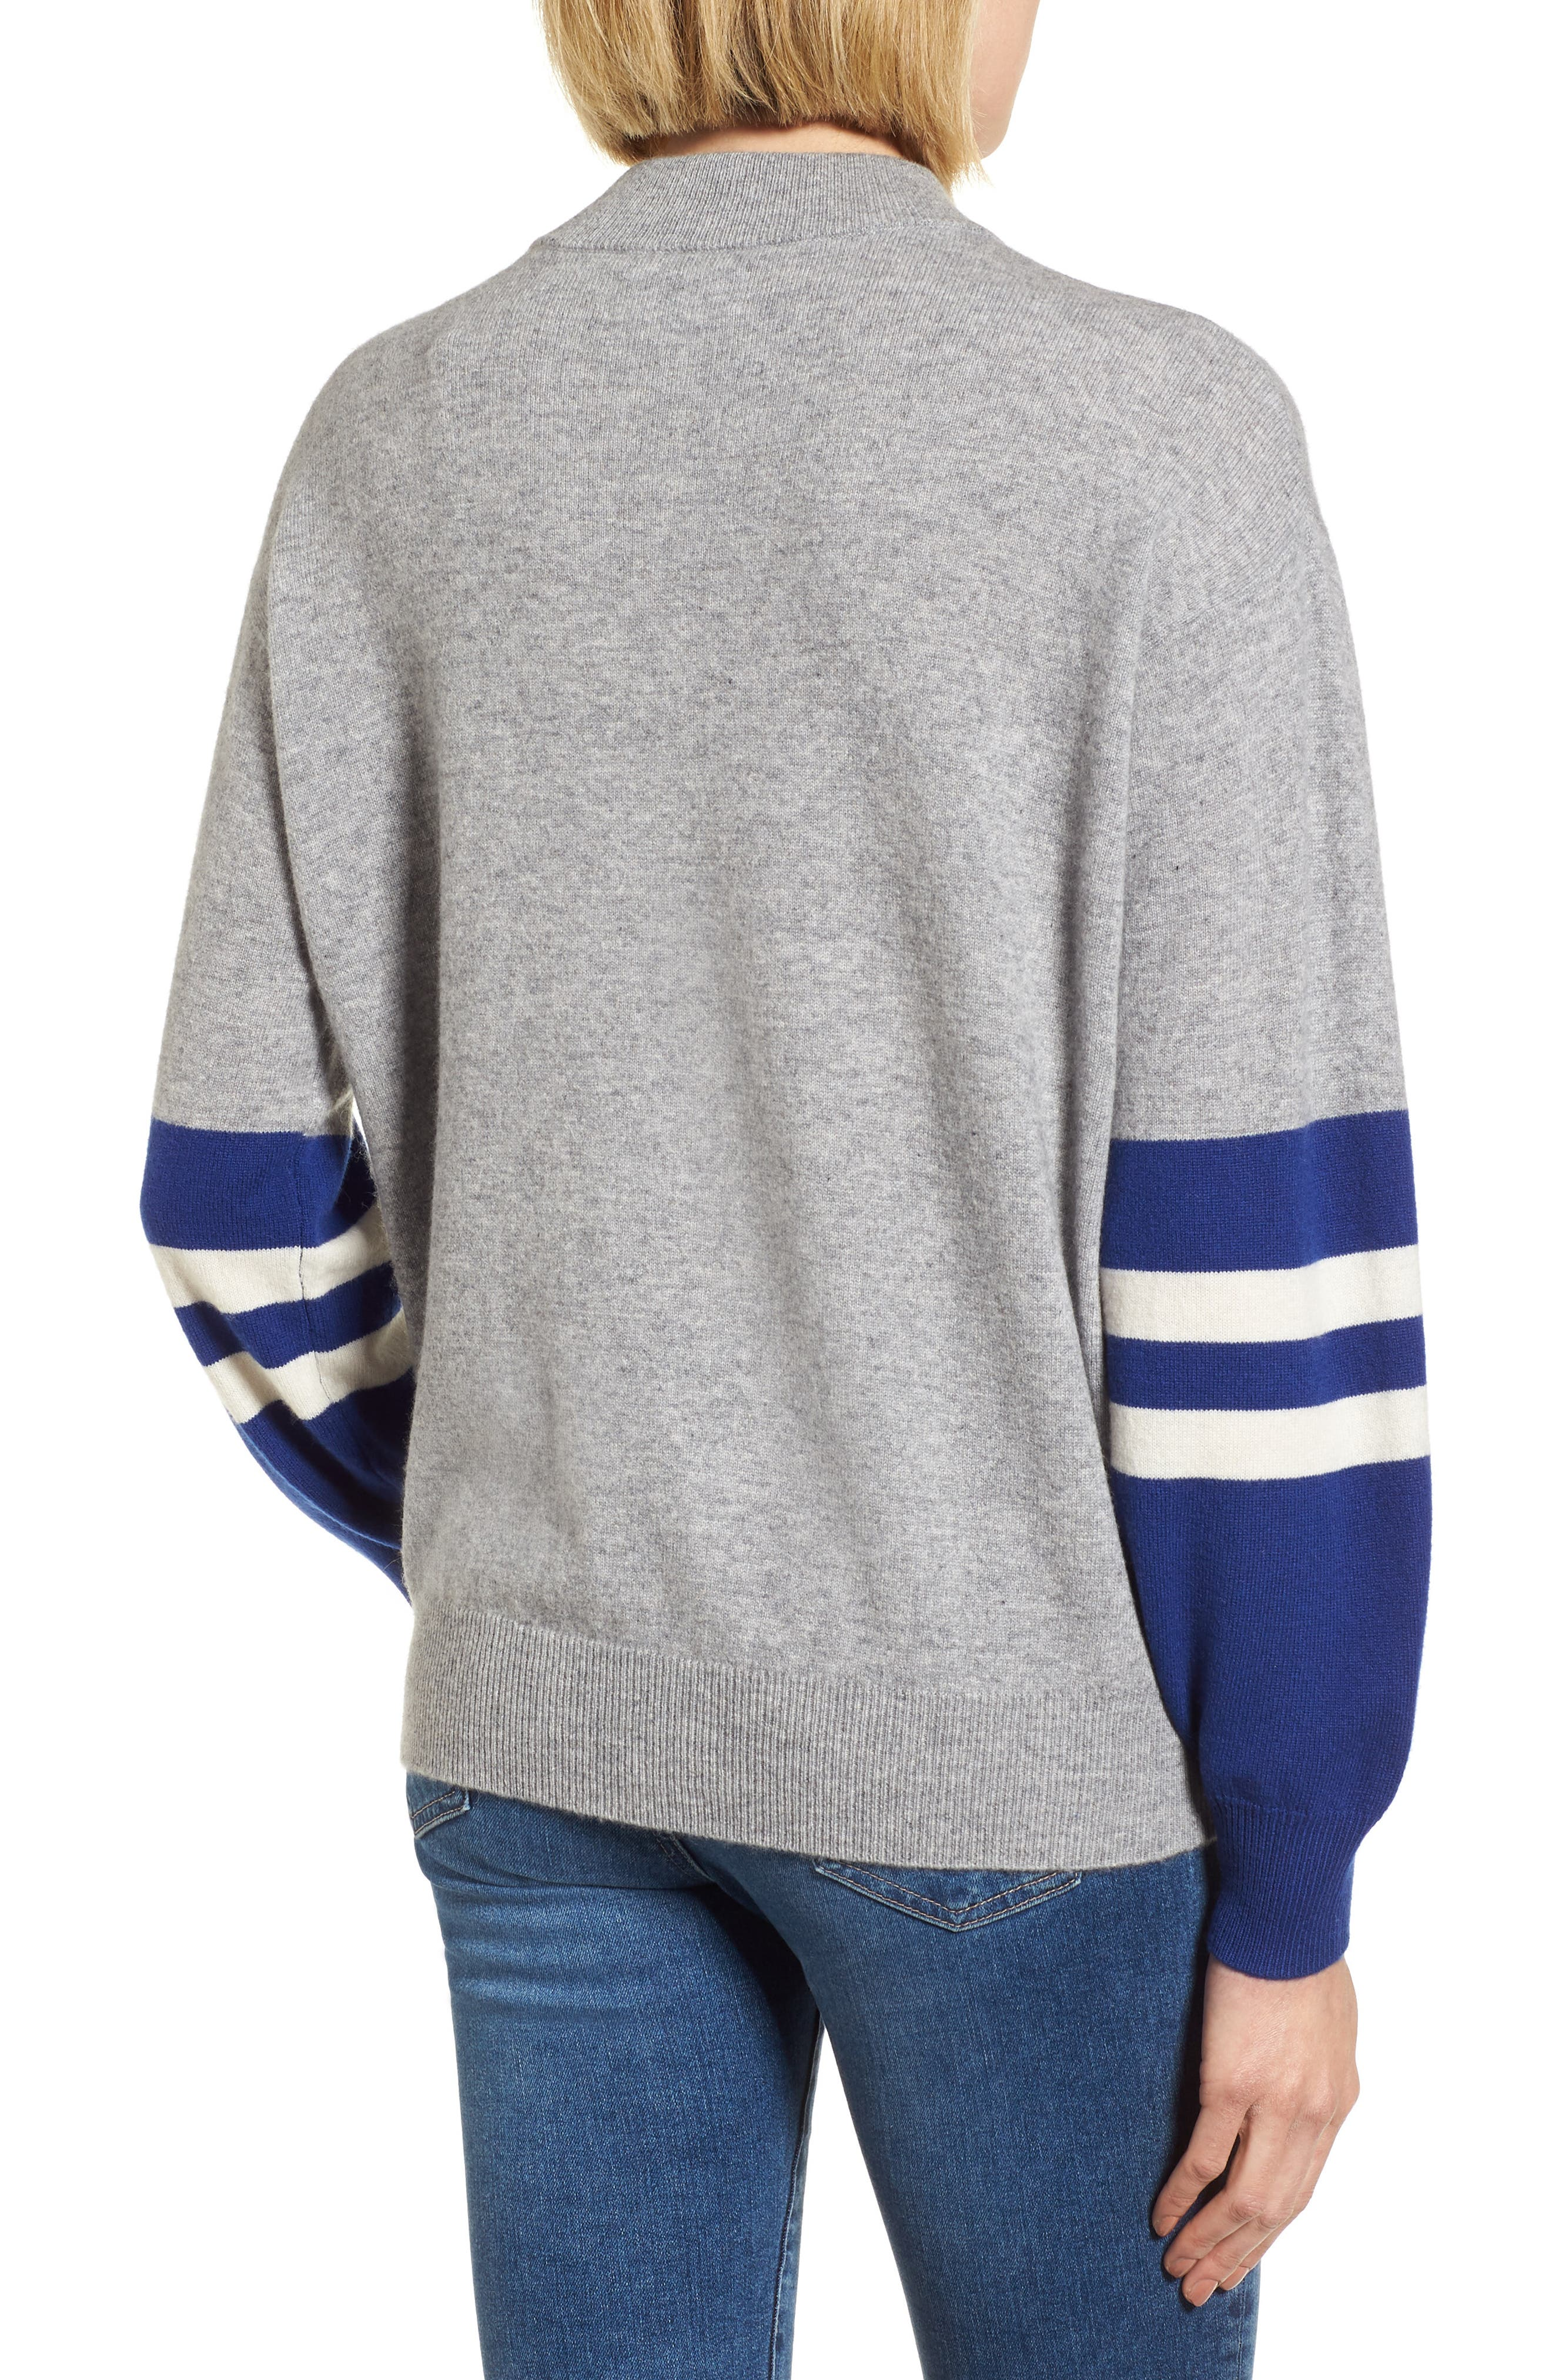 Colorblock Cashmere Sweater,                             Alternate thumbnail 2, color,                             HEATHER GREY